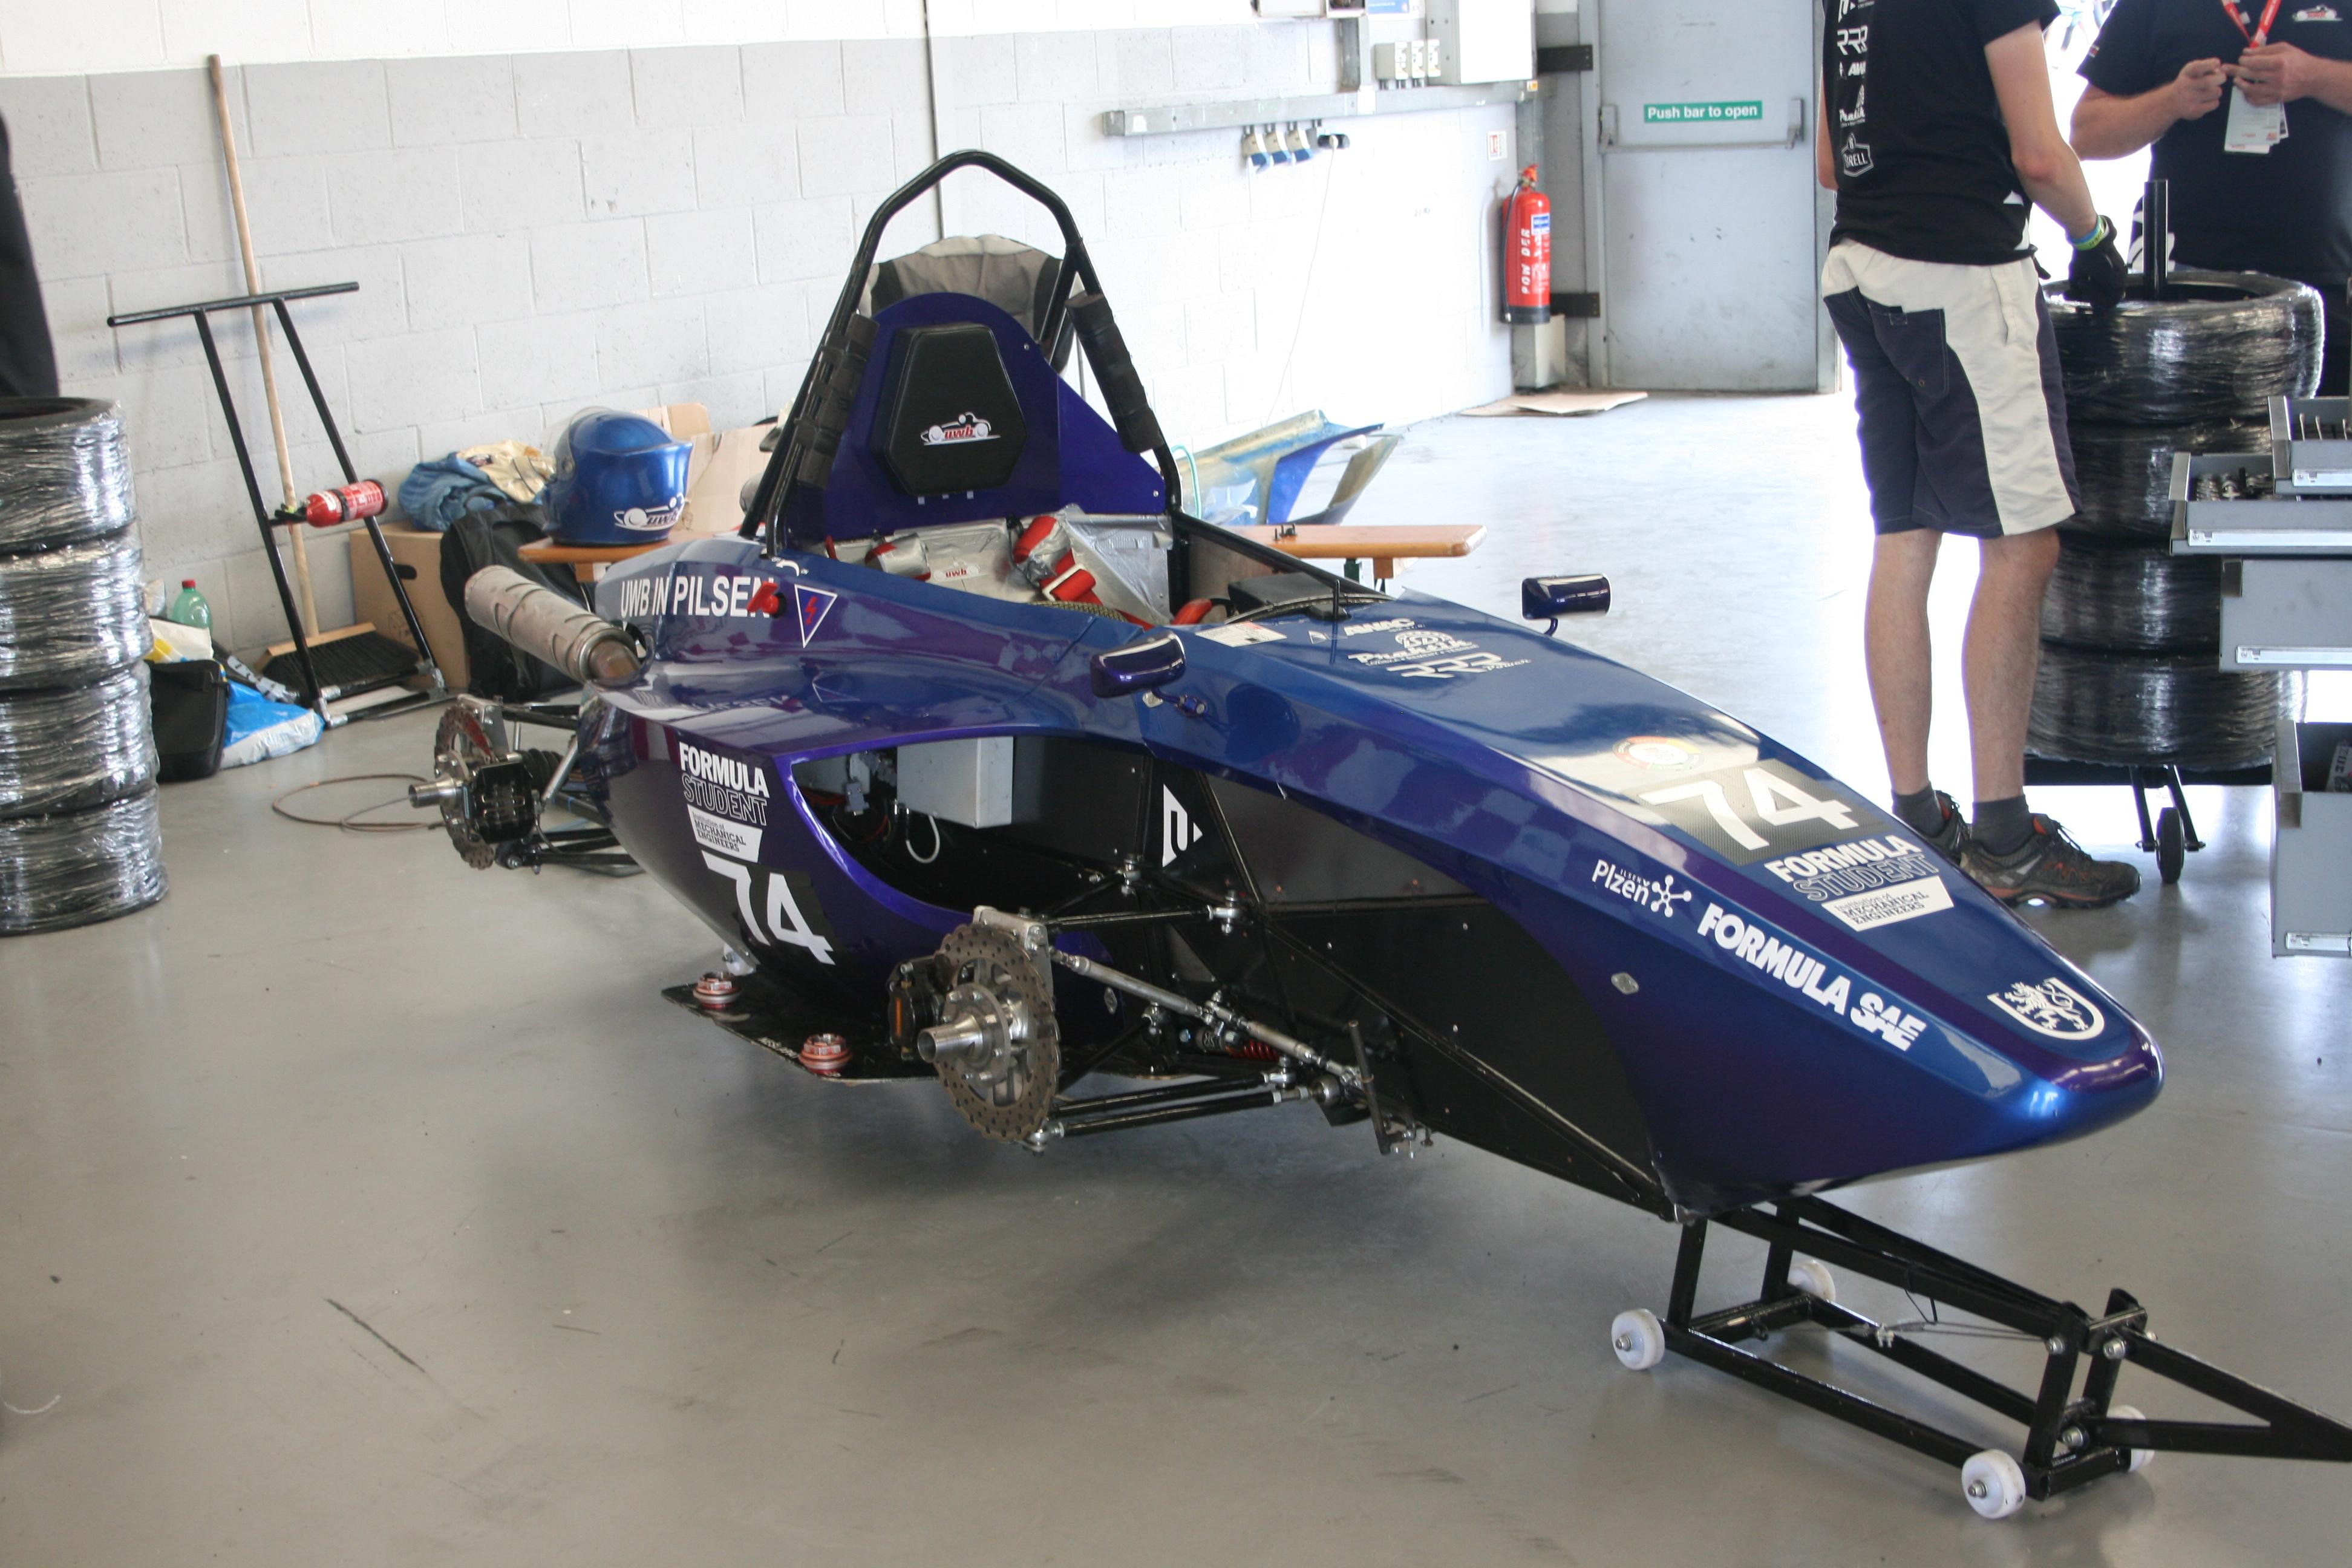 Formulastudent_proformance20